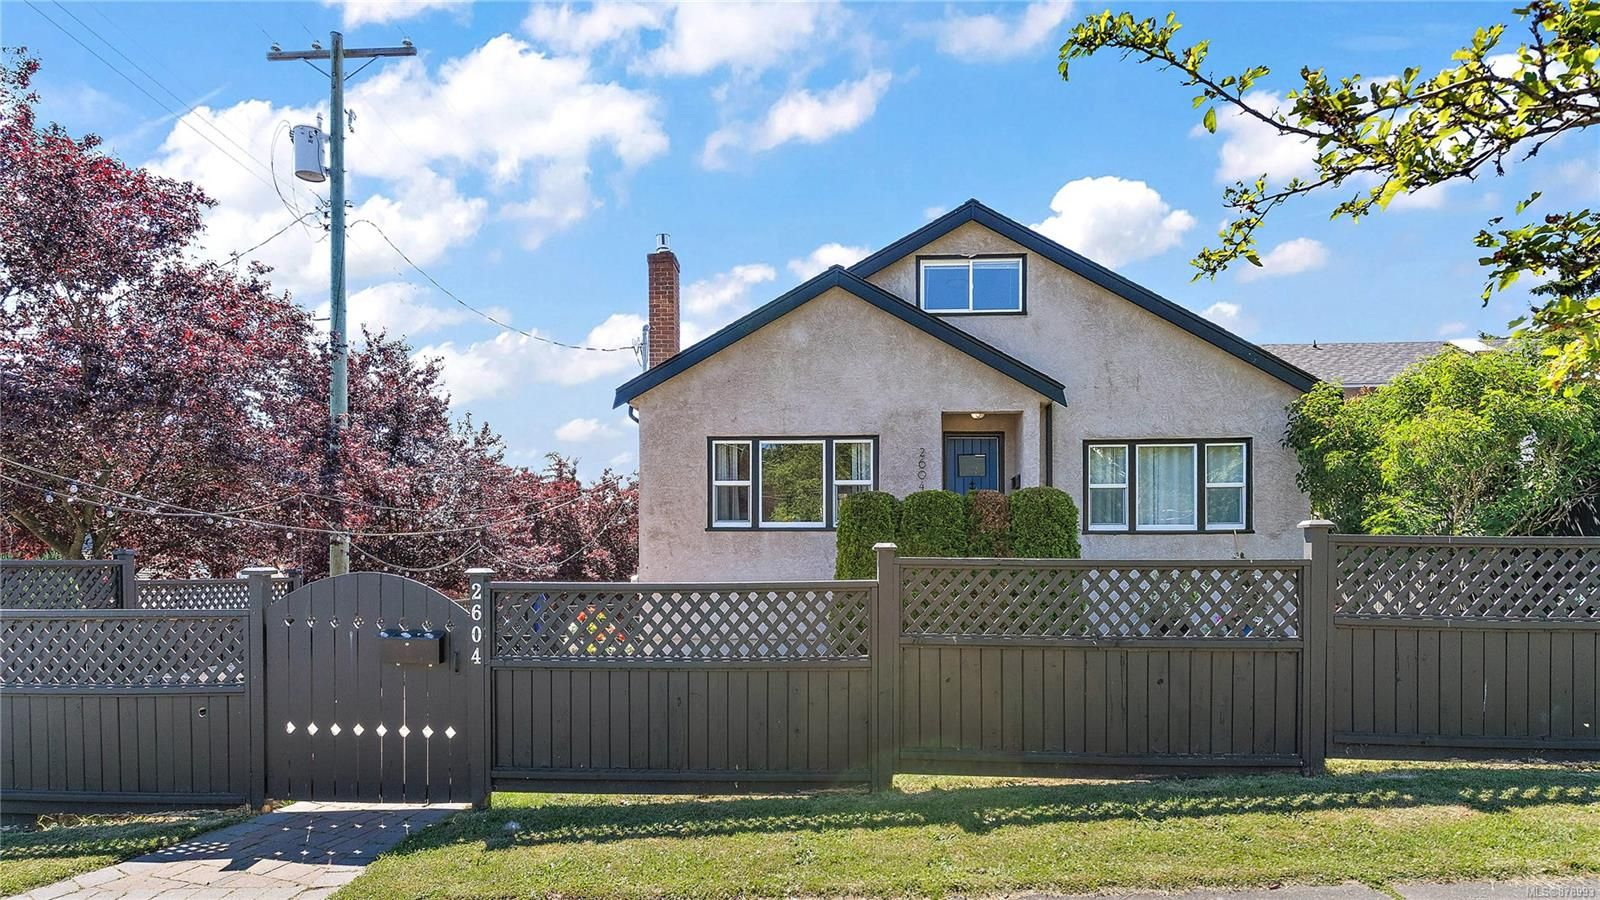 Main Photo: 2604 Blackwood St in : Vi Hillside House for sale (Victoria)  : MLS®# 878993